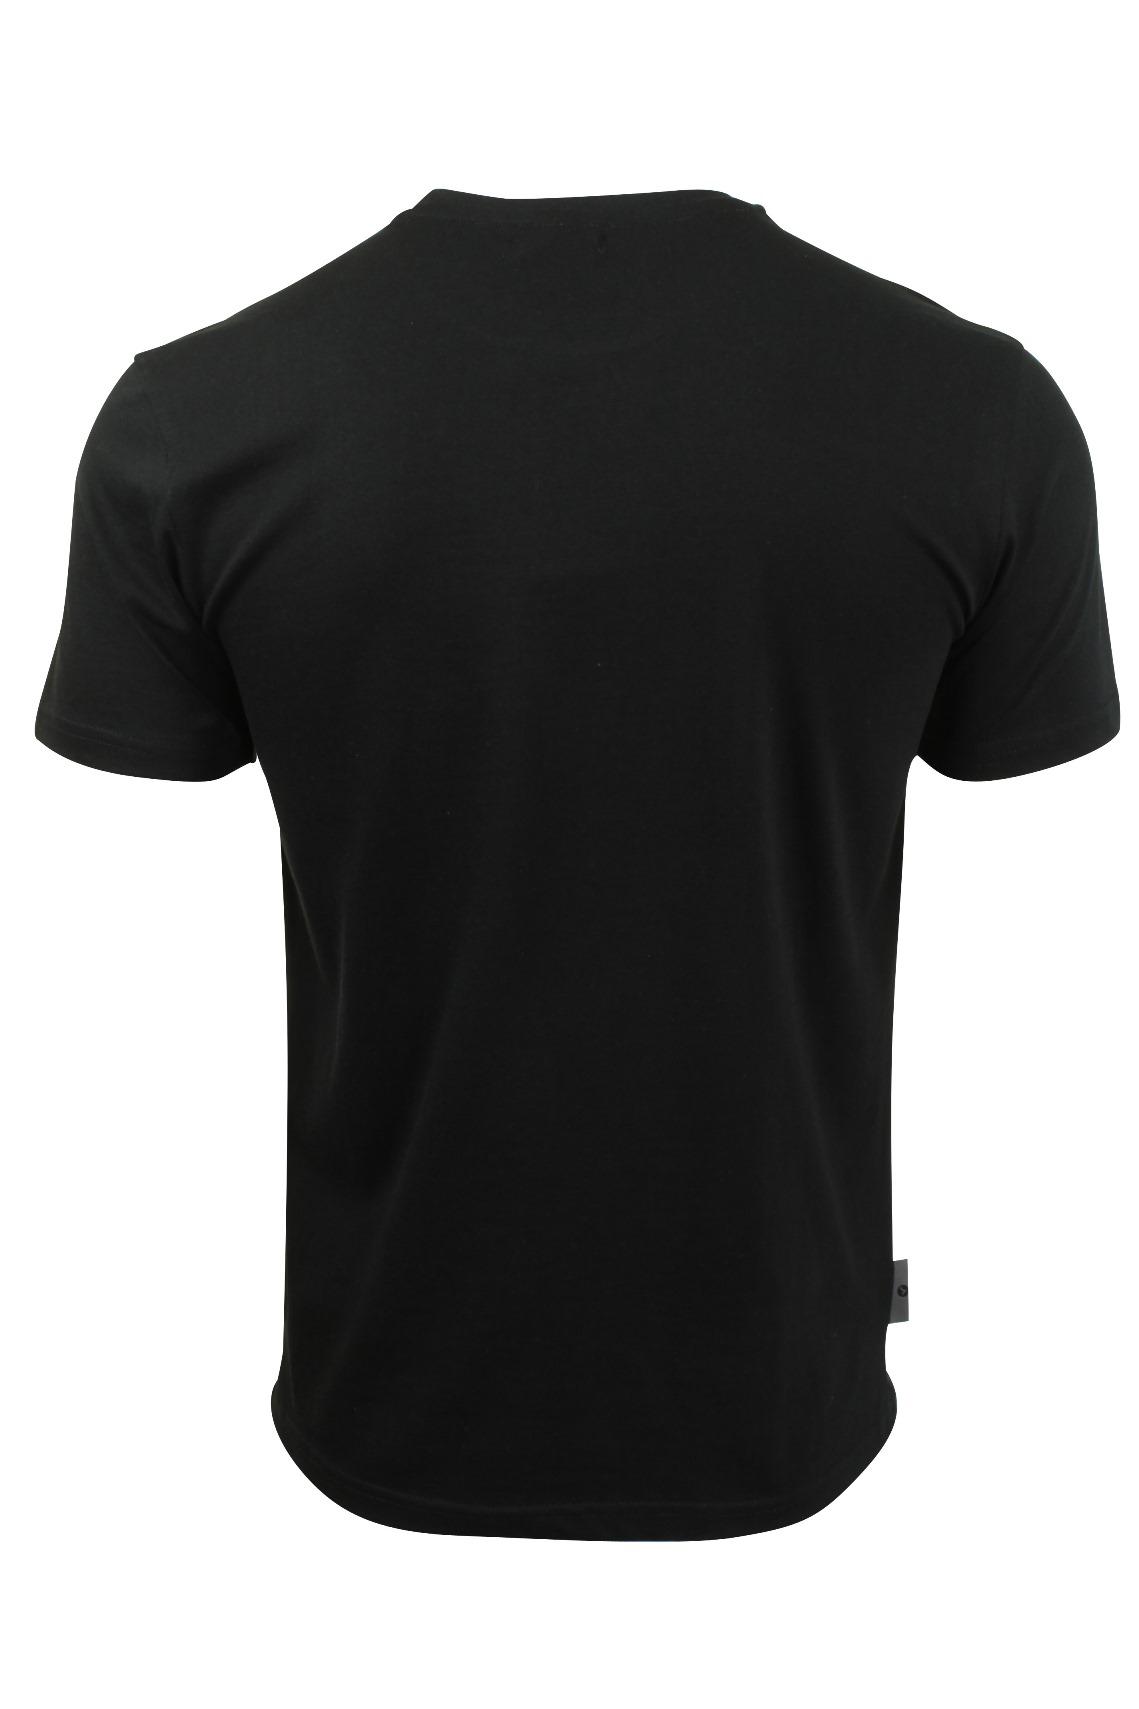 Hombre-Camiseta-De-Voi-Jeans-Manga-Corta miniatura 4